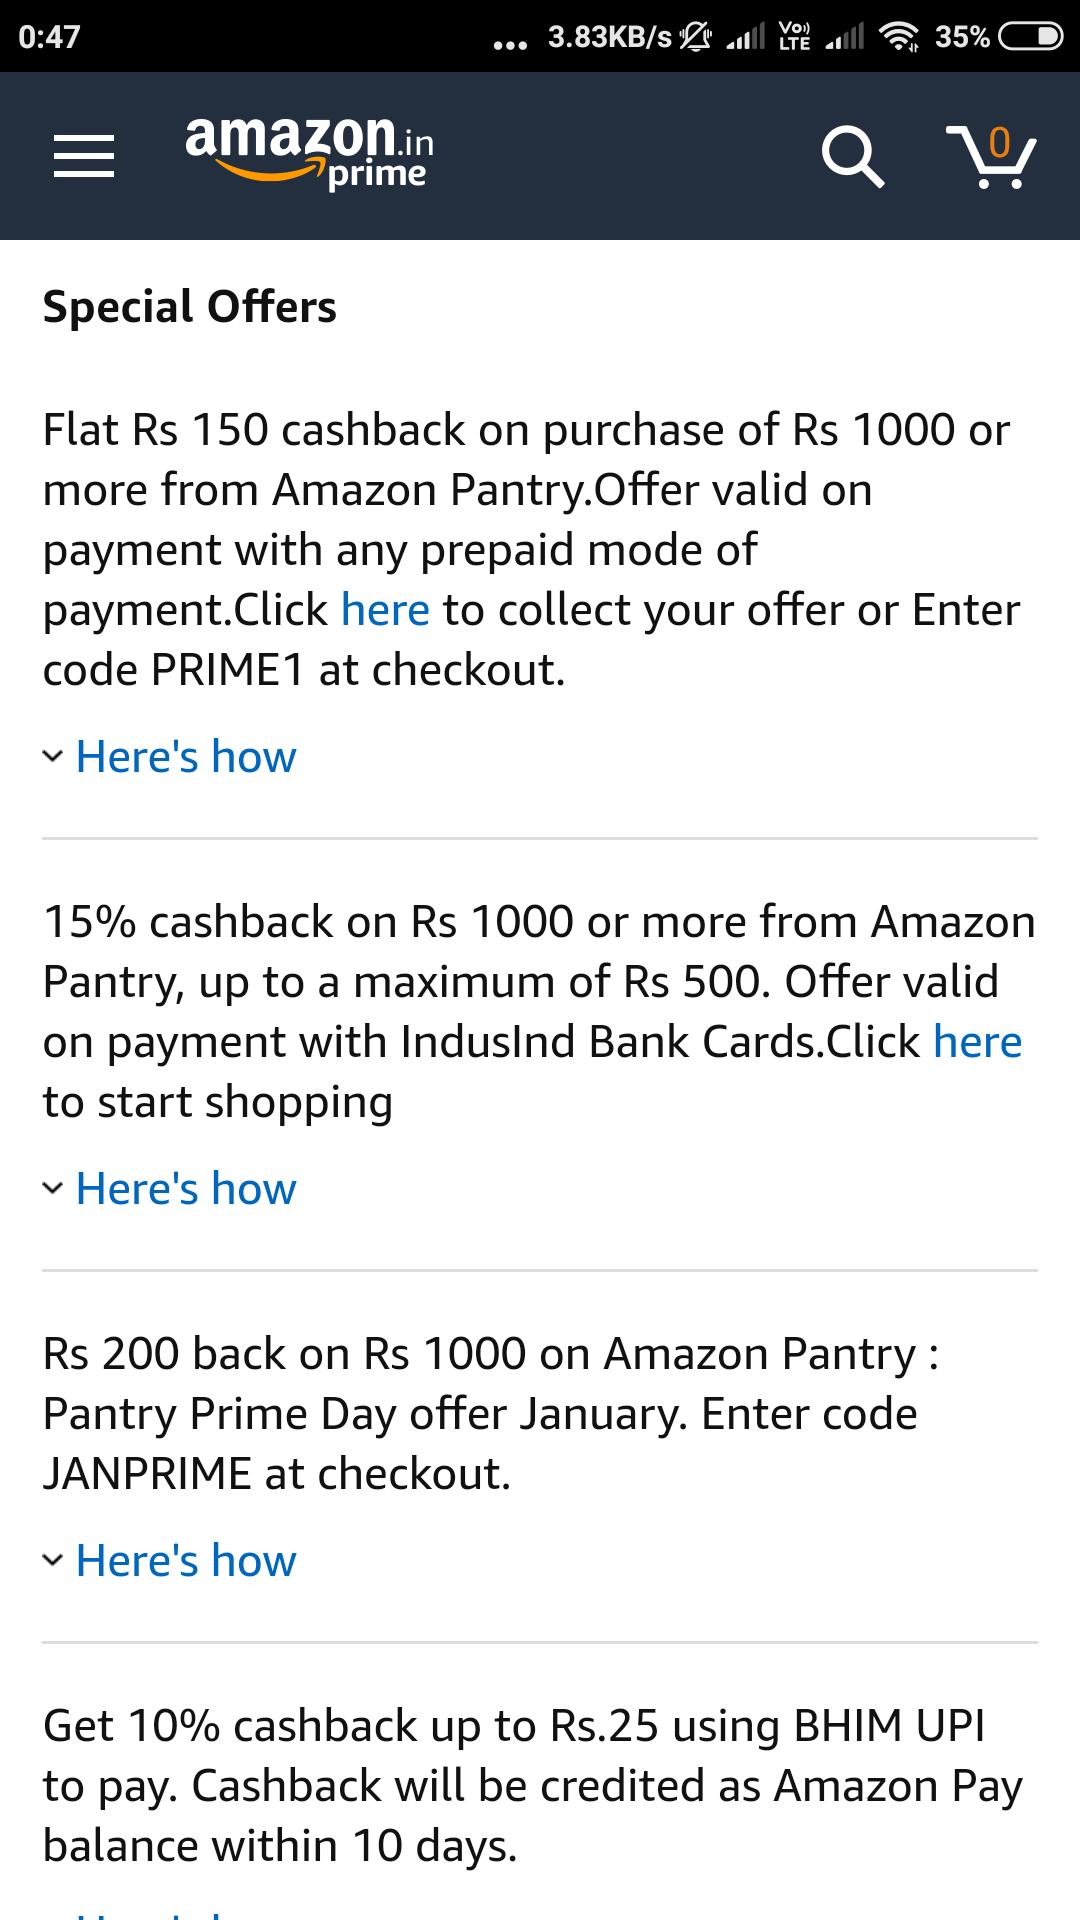 https://cdn0.desidime.com/attachments/photos/545810/original/Screenshot_2019-01-09-00-47-42-301_in.amazon.mShop.android.shopping.png?1546975323